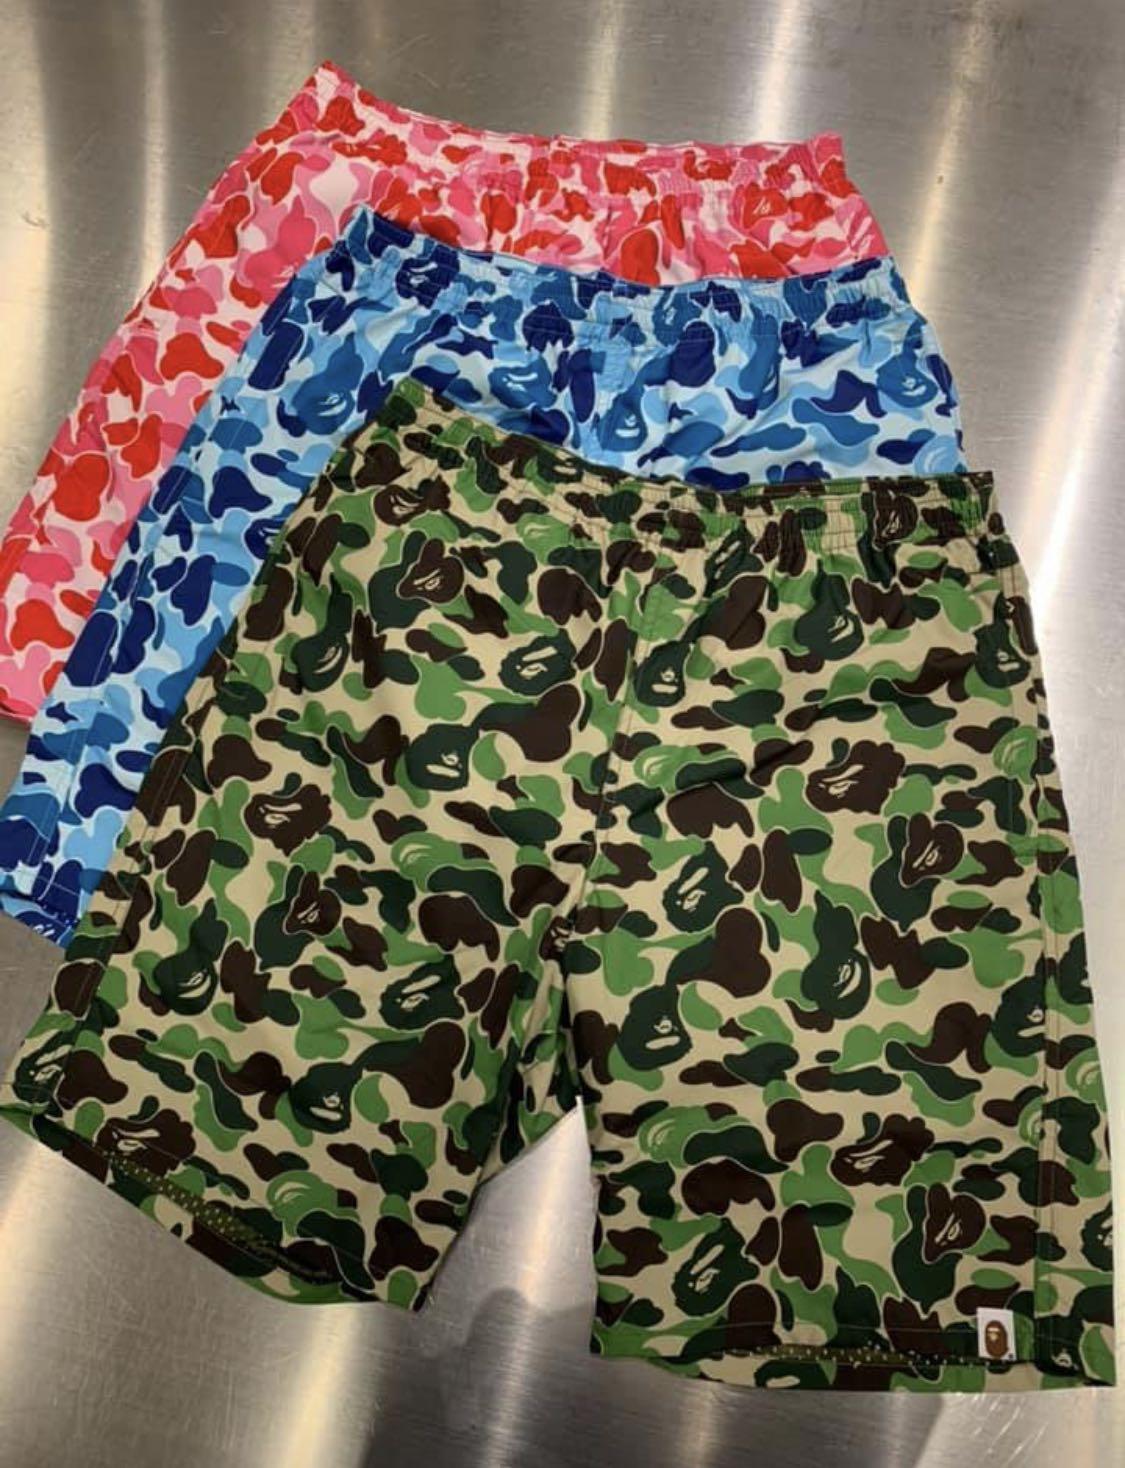 ce99a5f2 BAPE ABC BEACH PANTS, Men's Fashion, Clothes, Bottoms on Carousell